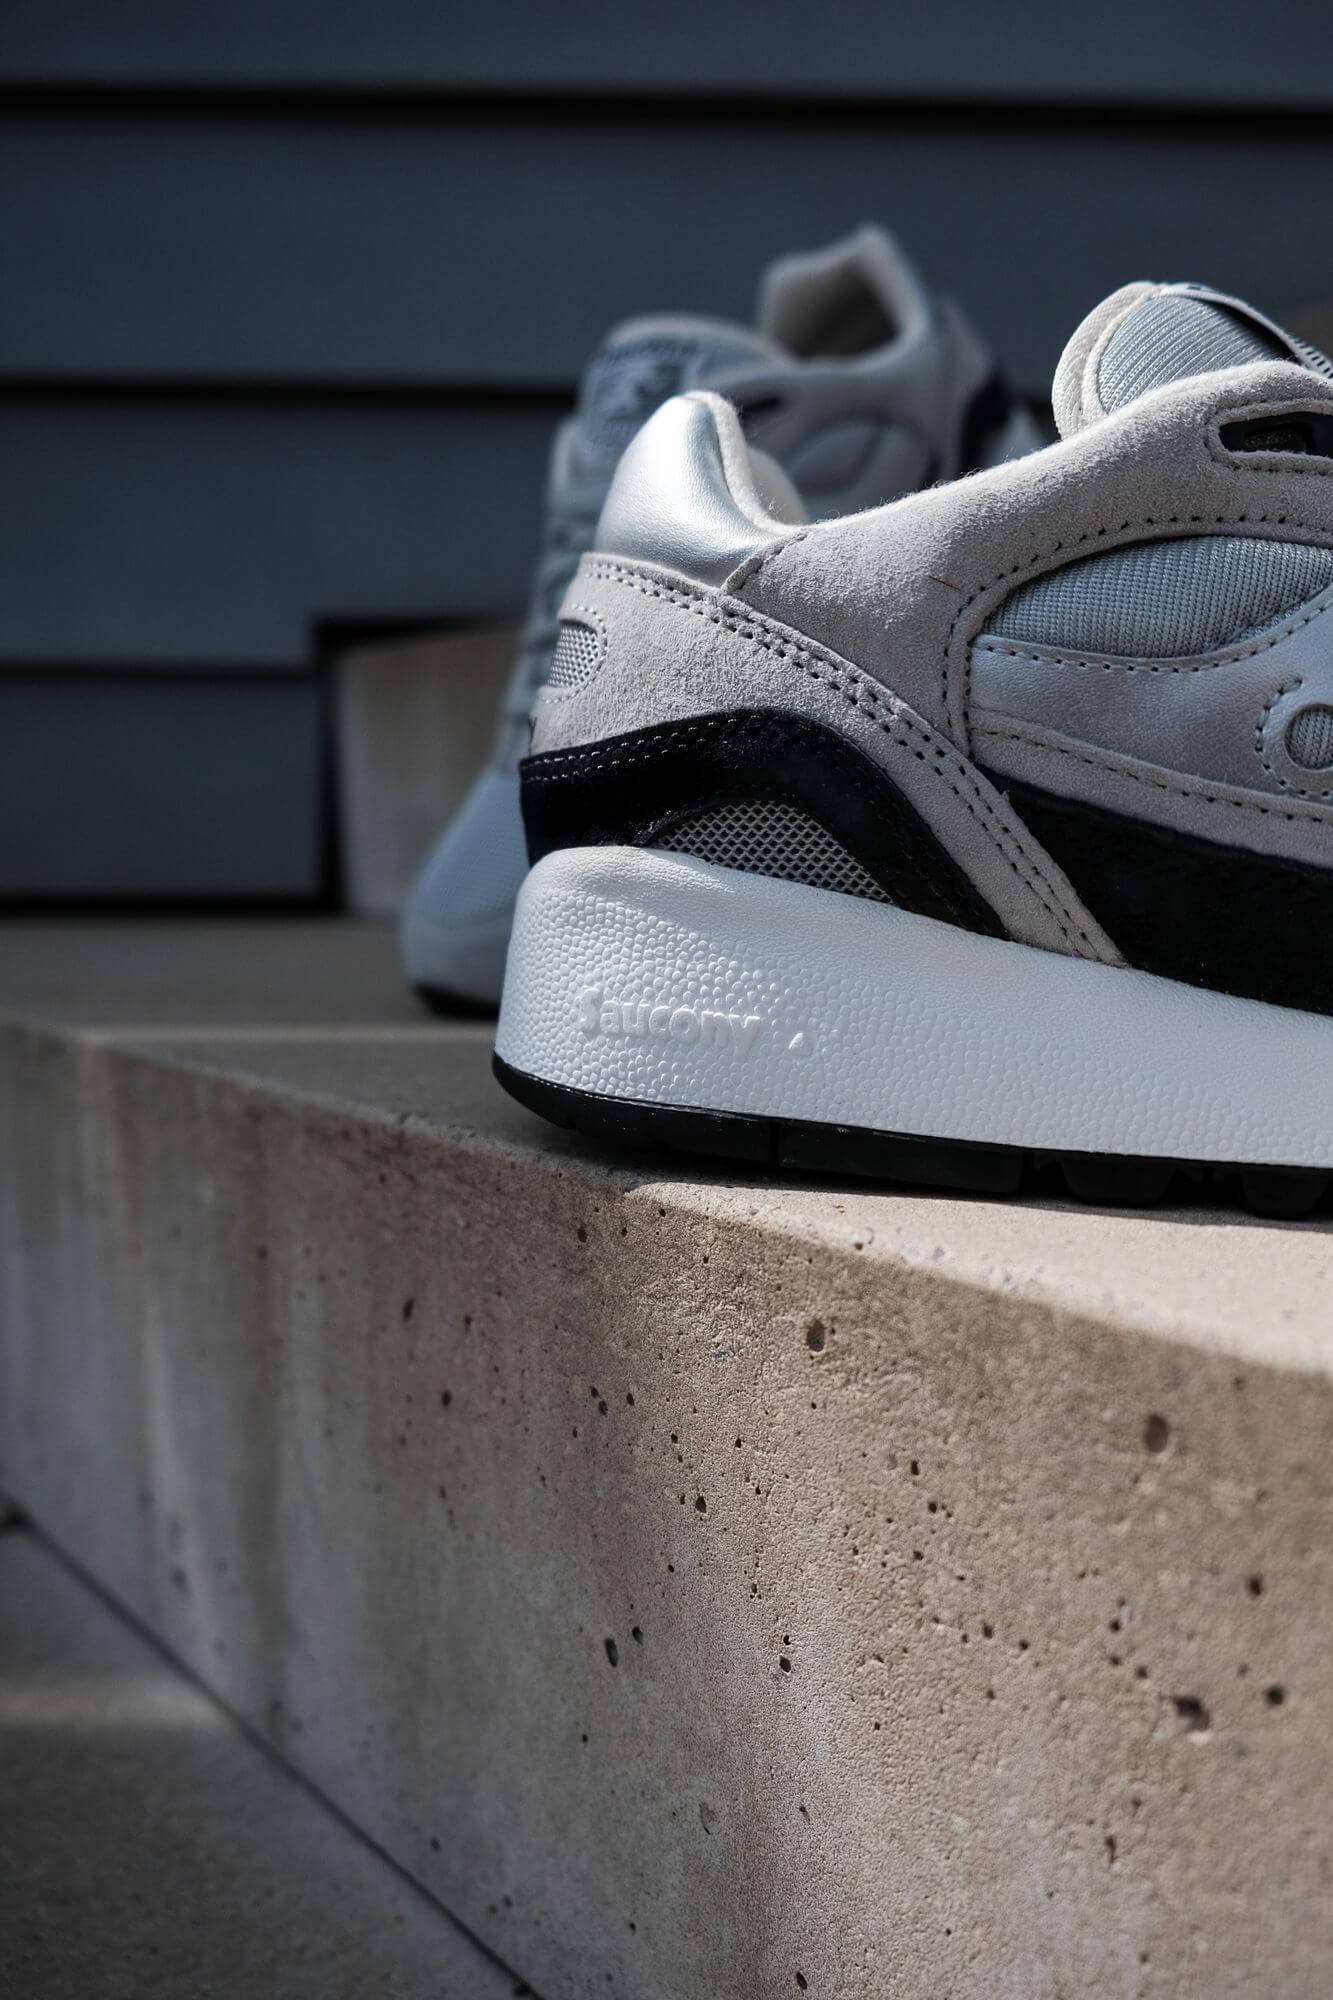 heel details - Saucony Originals Shadow 6000 - silver/grey - S70441-7